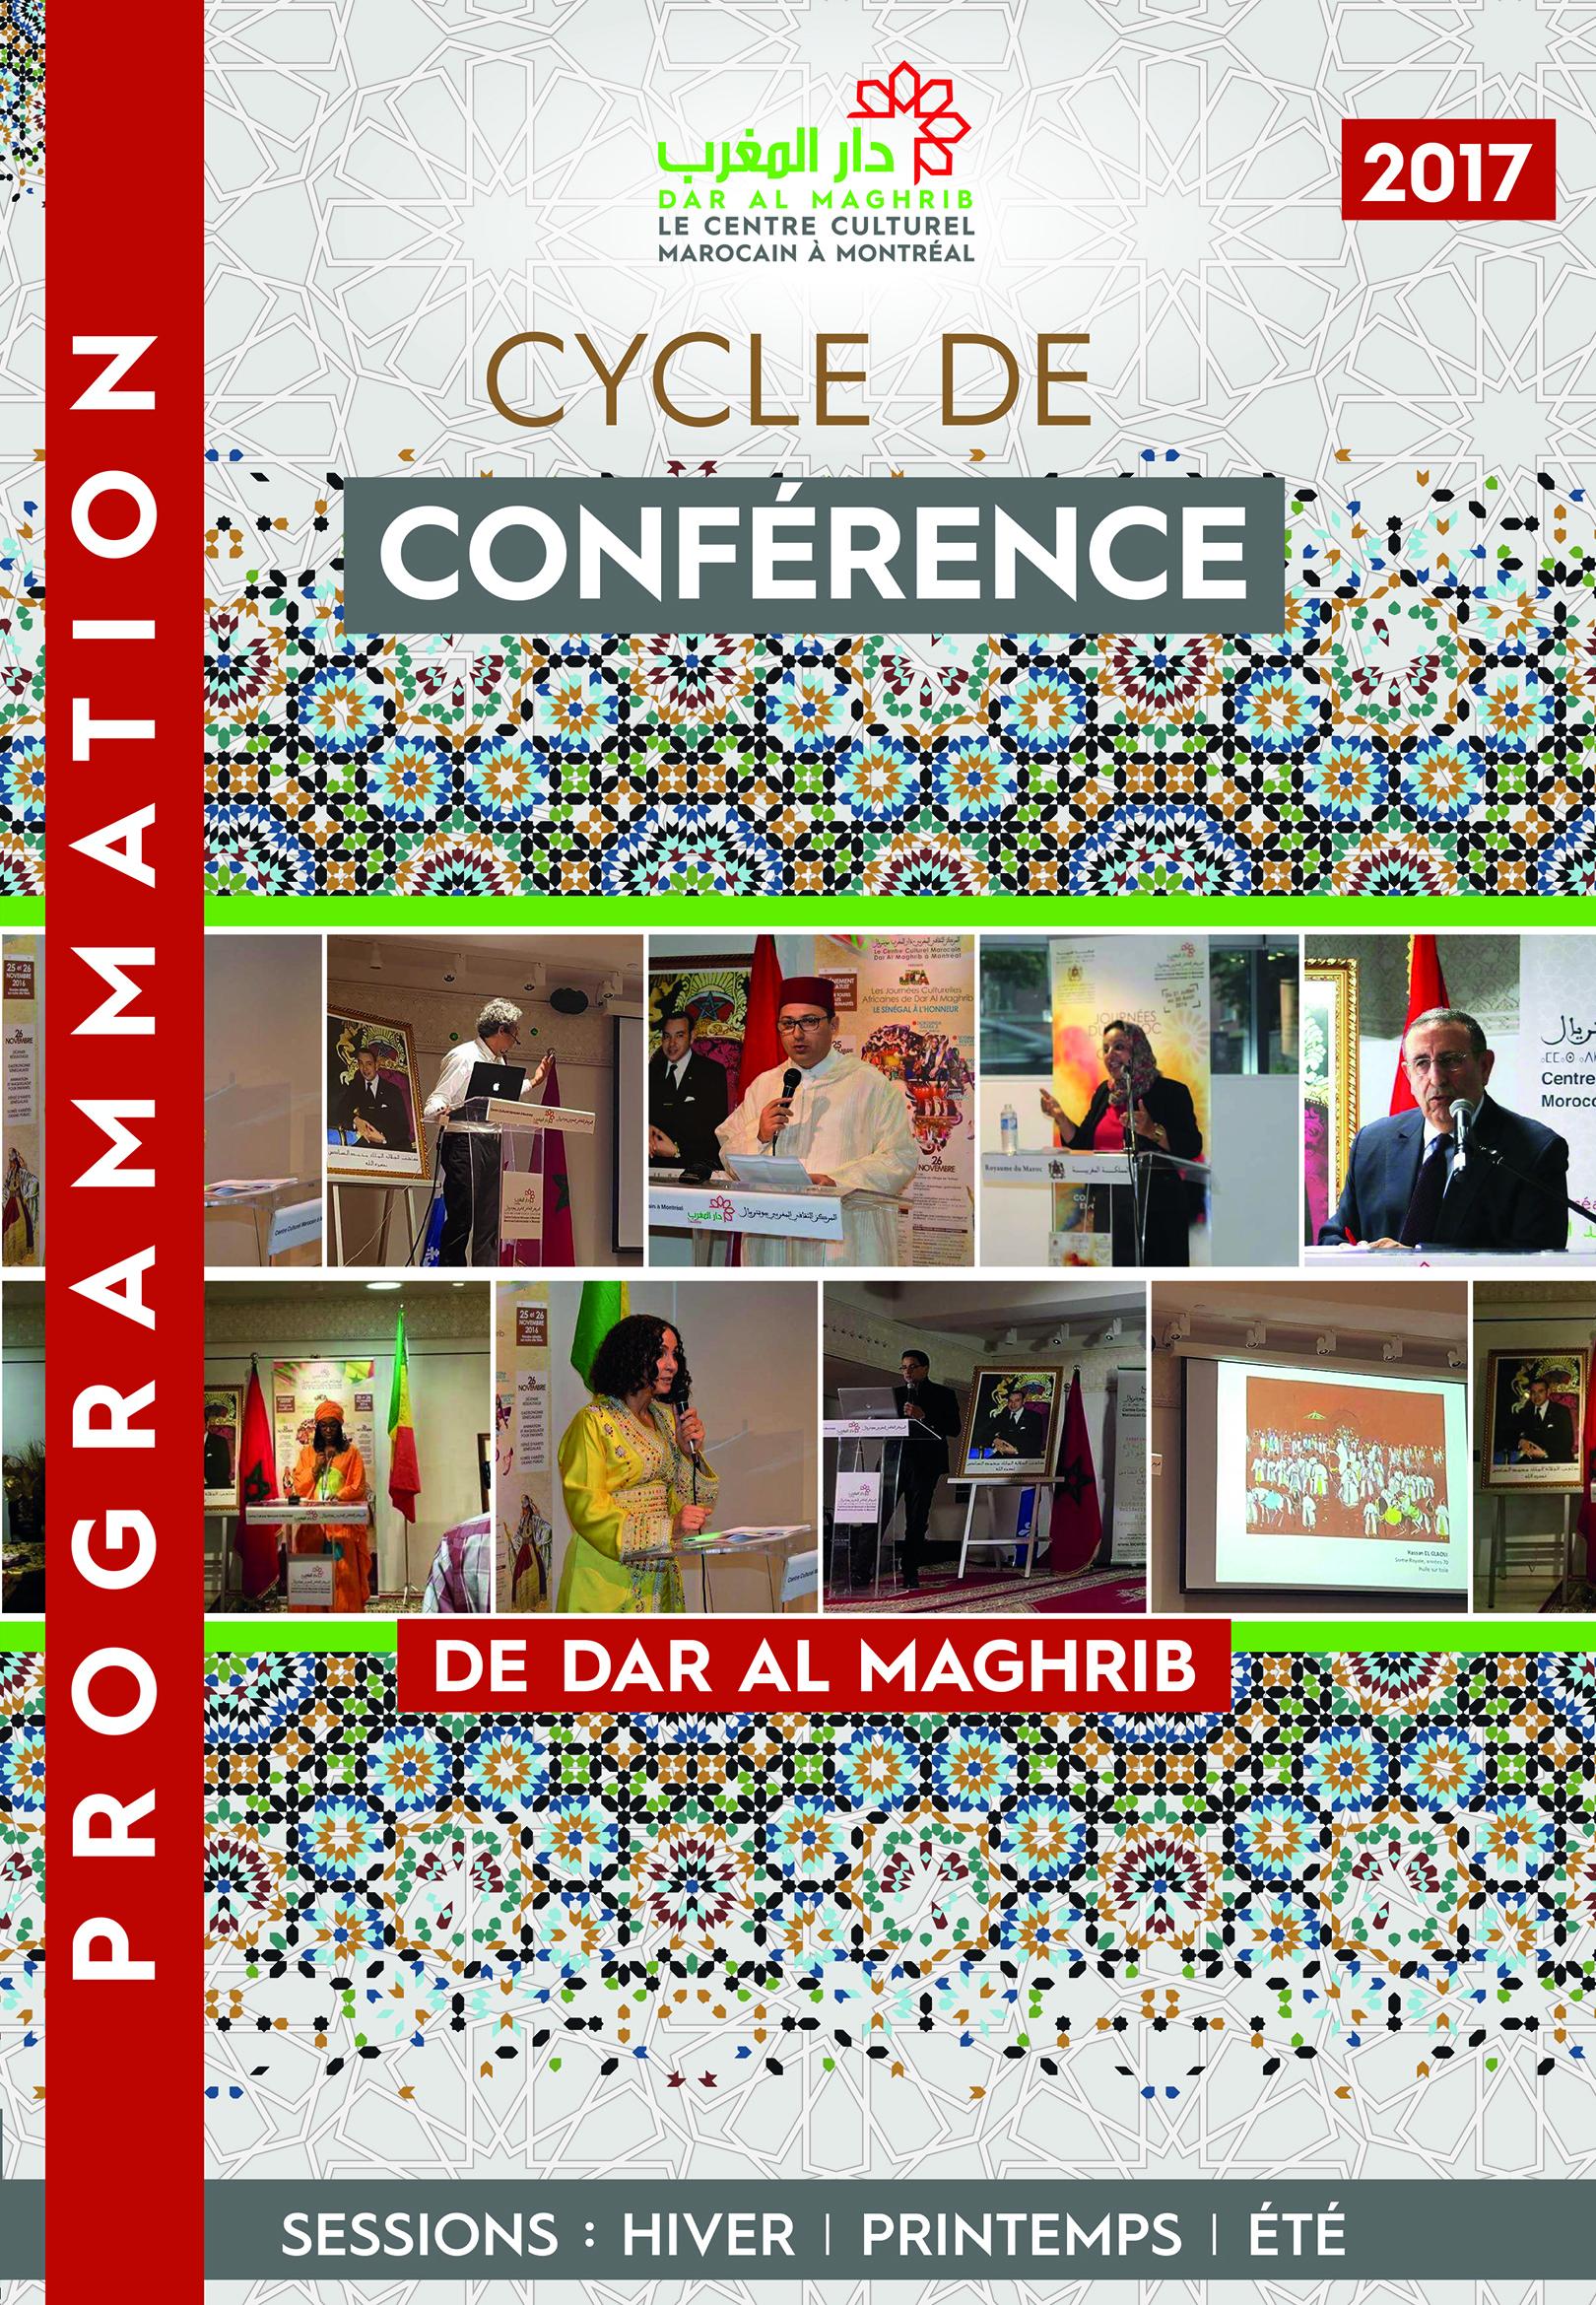 Cycle de conférences Dar Al Maghrib programmation 2017